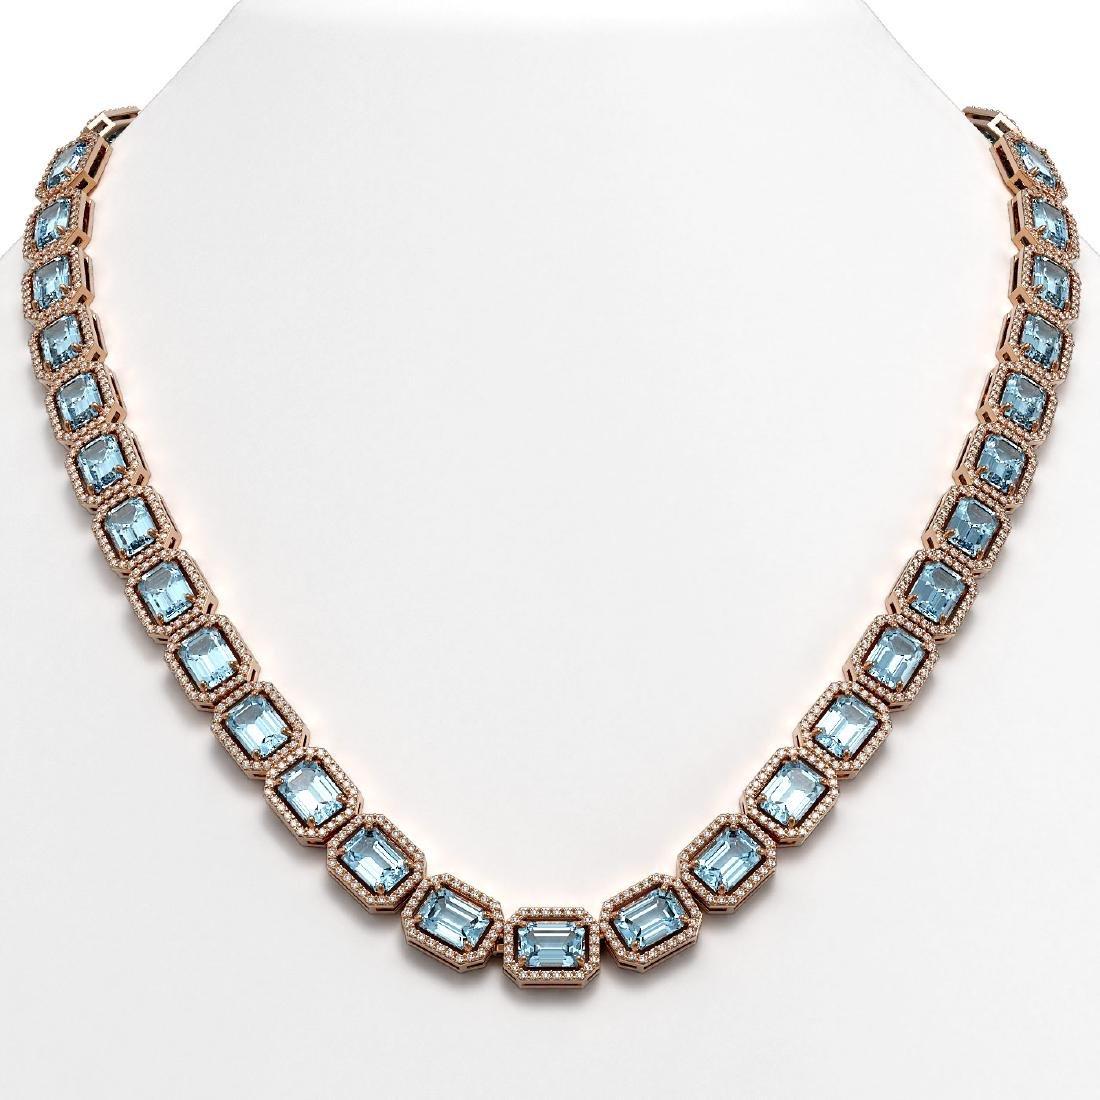 52.89 CTW Sky Topaz & Diamond Halo Necklace 10K Rose